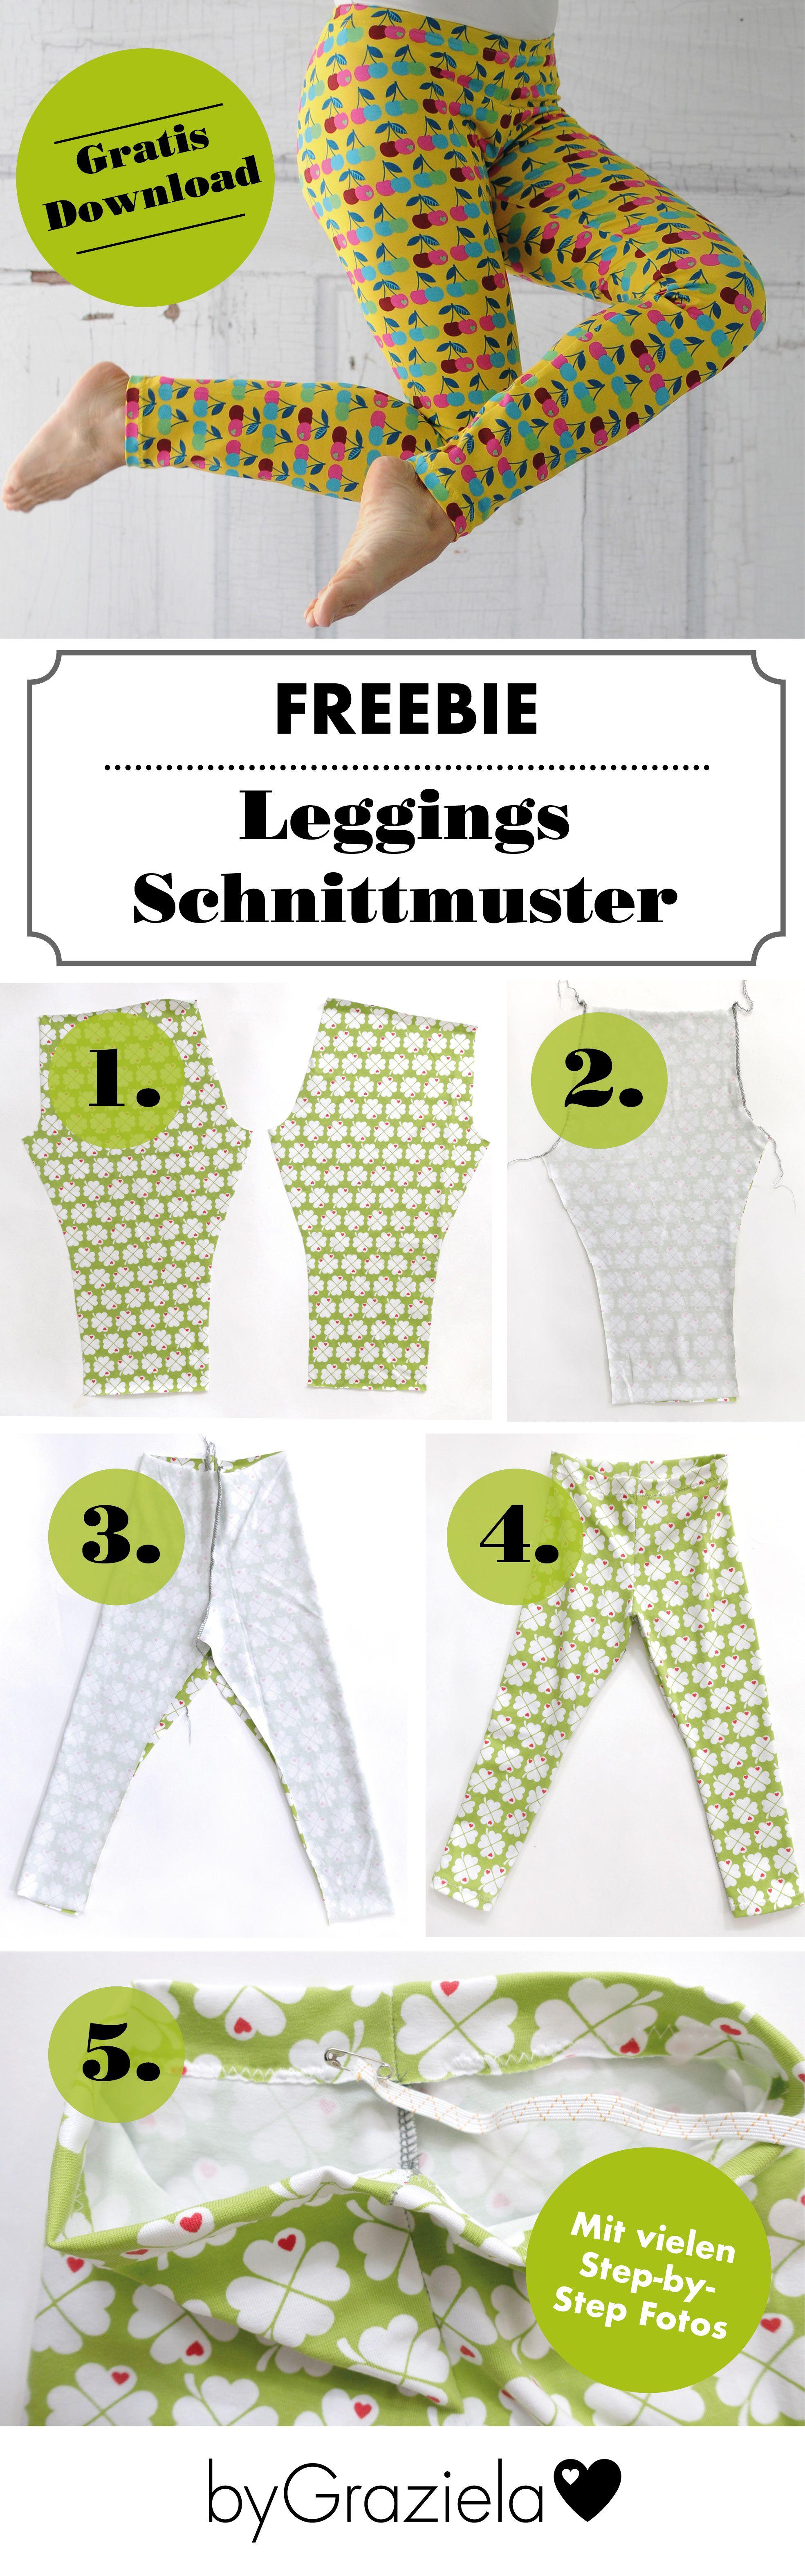 ♥ FREEBIE ♥ – Gratis Leggings Schnittmuster für Damen | Pinterest ...